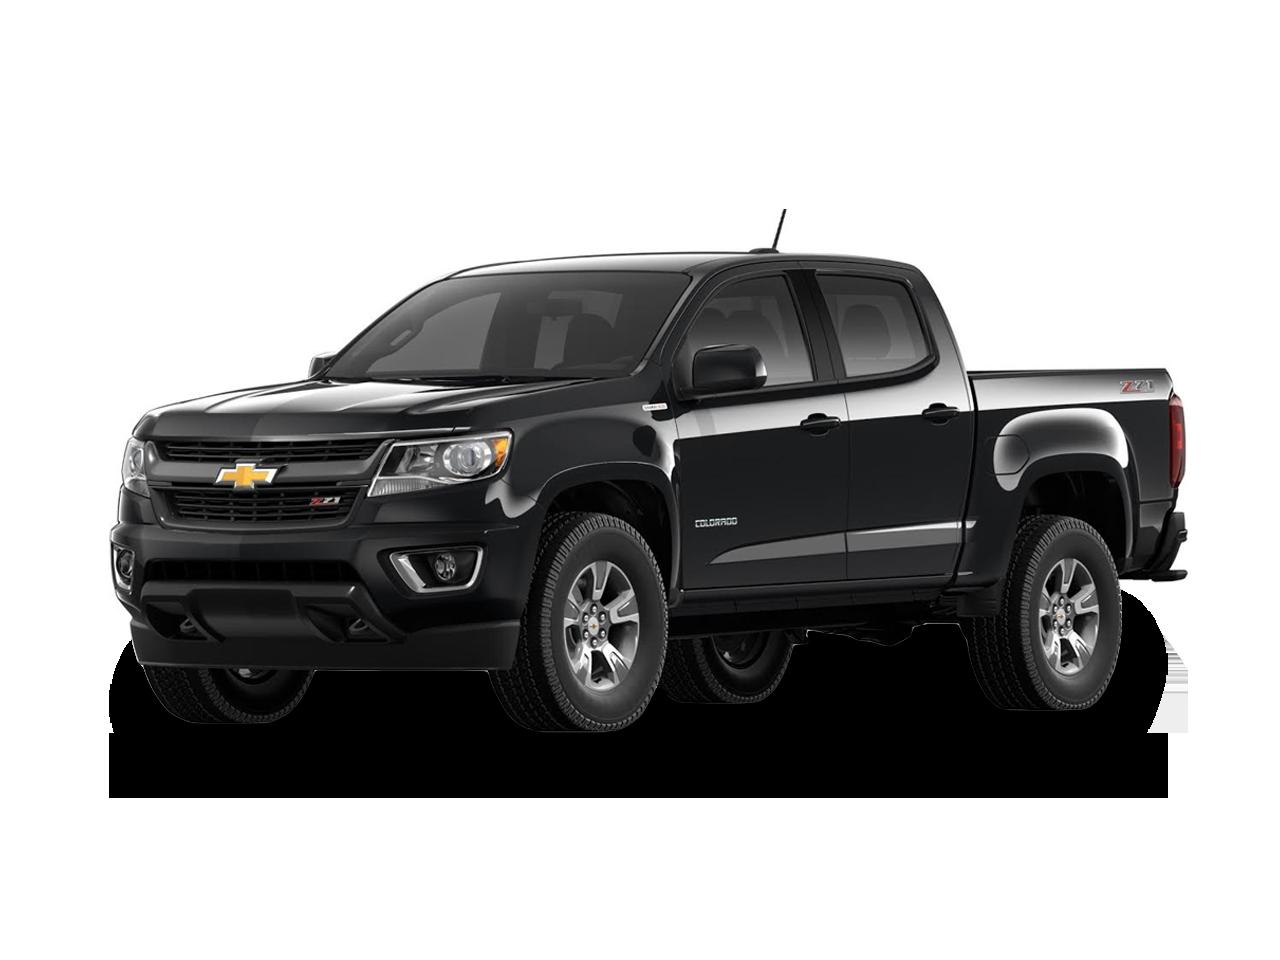 77 Best Review 2019 Chevrolet Colorado Photos with 2019 Chevrolet Colorado